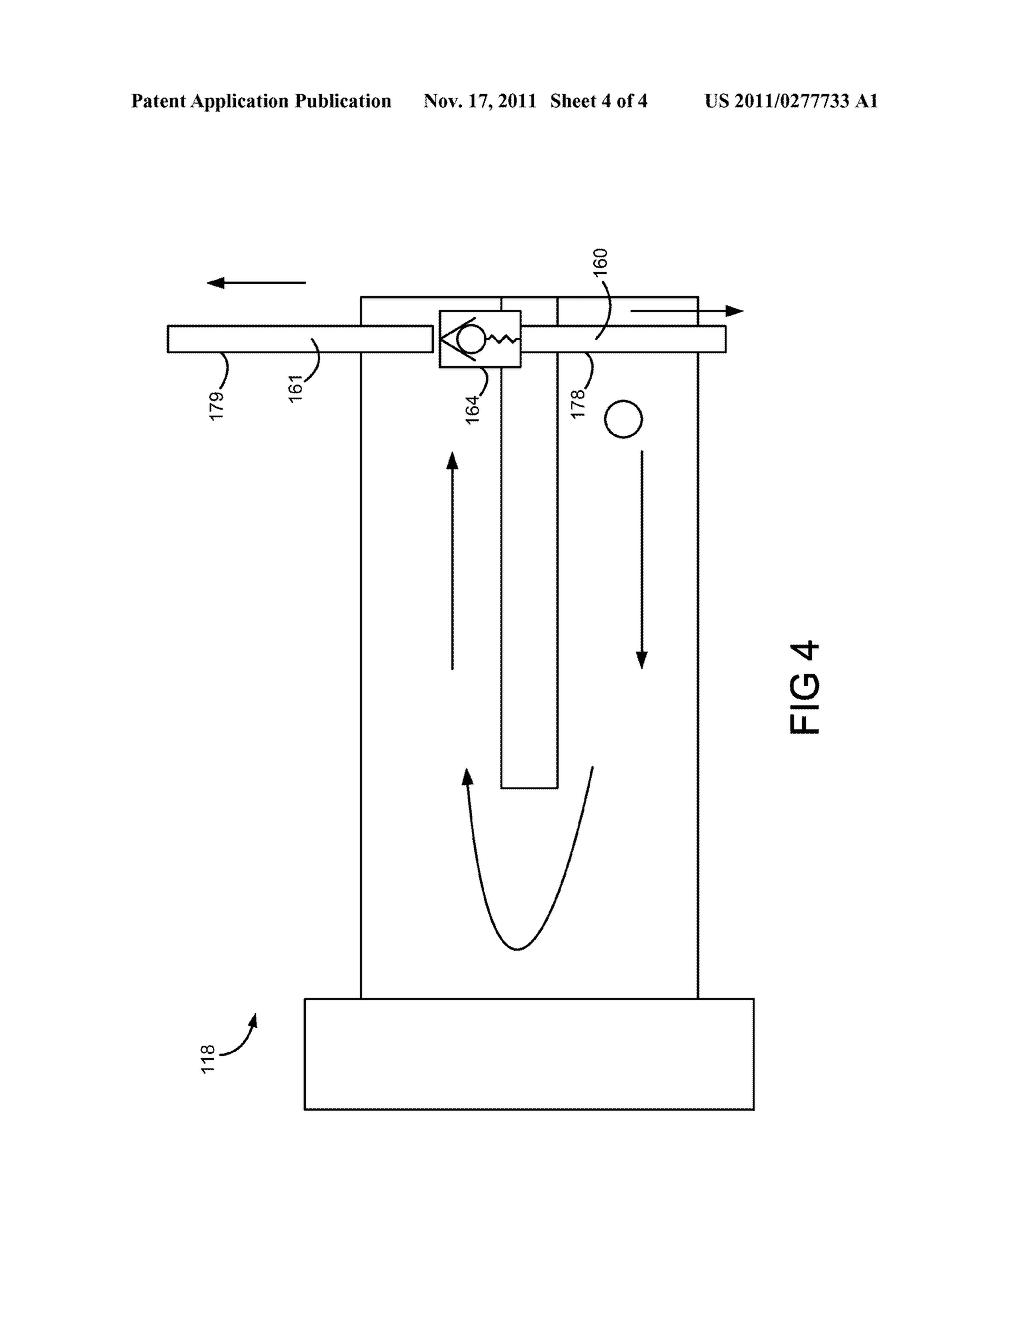 engine including positive crankcase ventilation - diagram, schematic, and  image 05